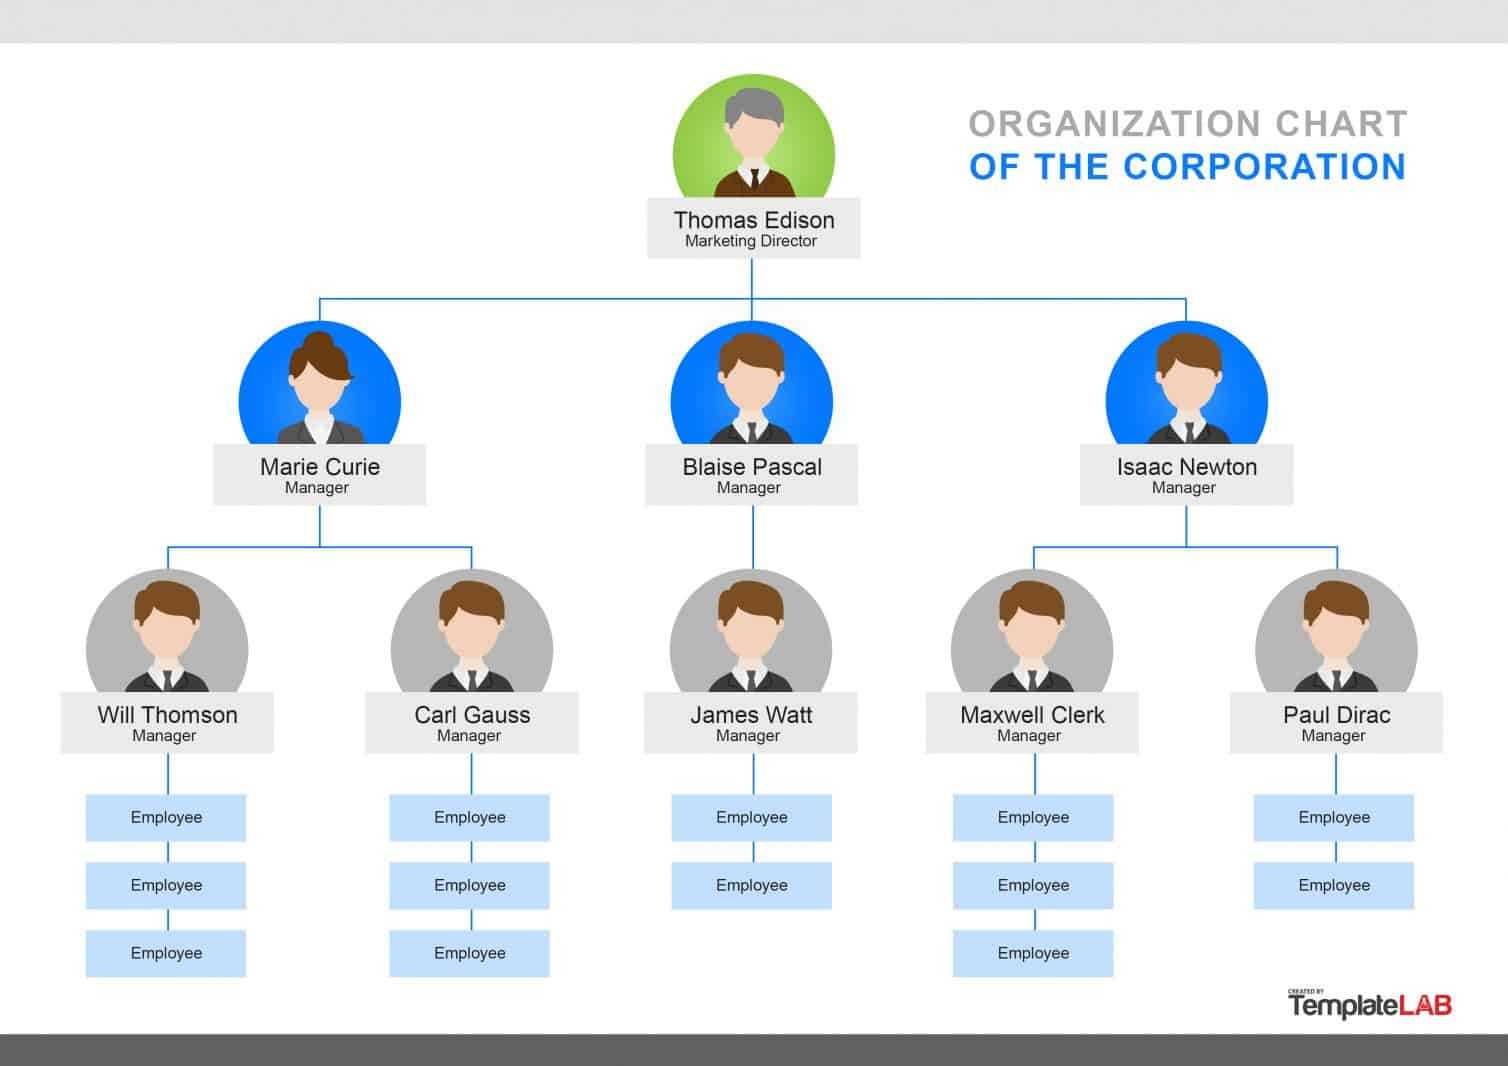 40 Organizational Chart Templates (Word, Excel, Powerpoint) inside Organogram Template Word Free